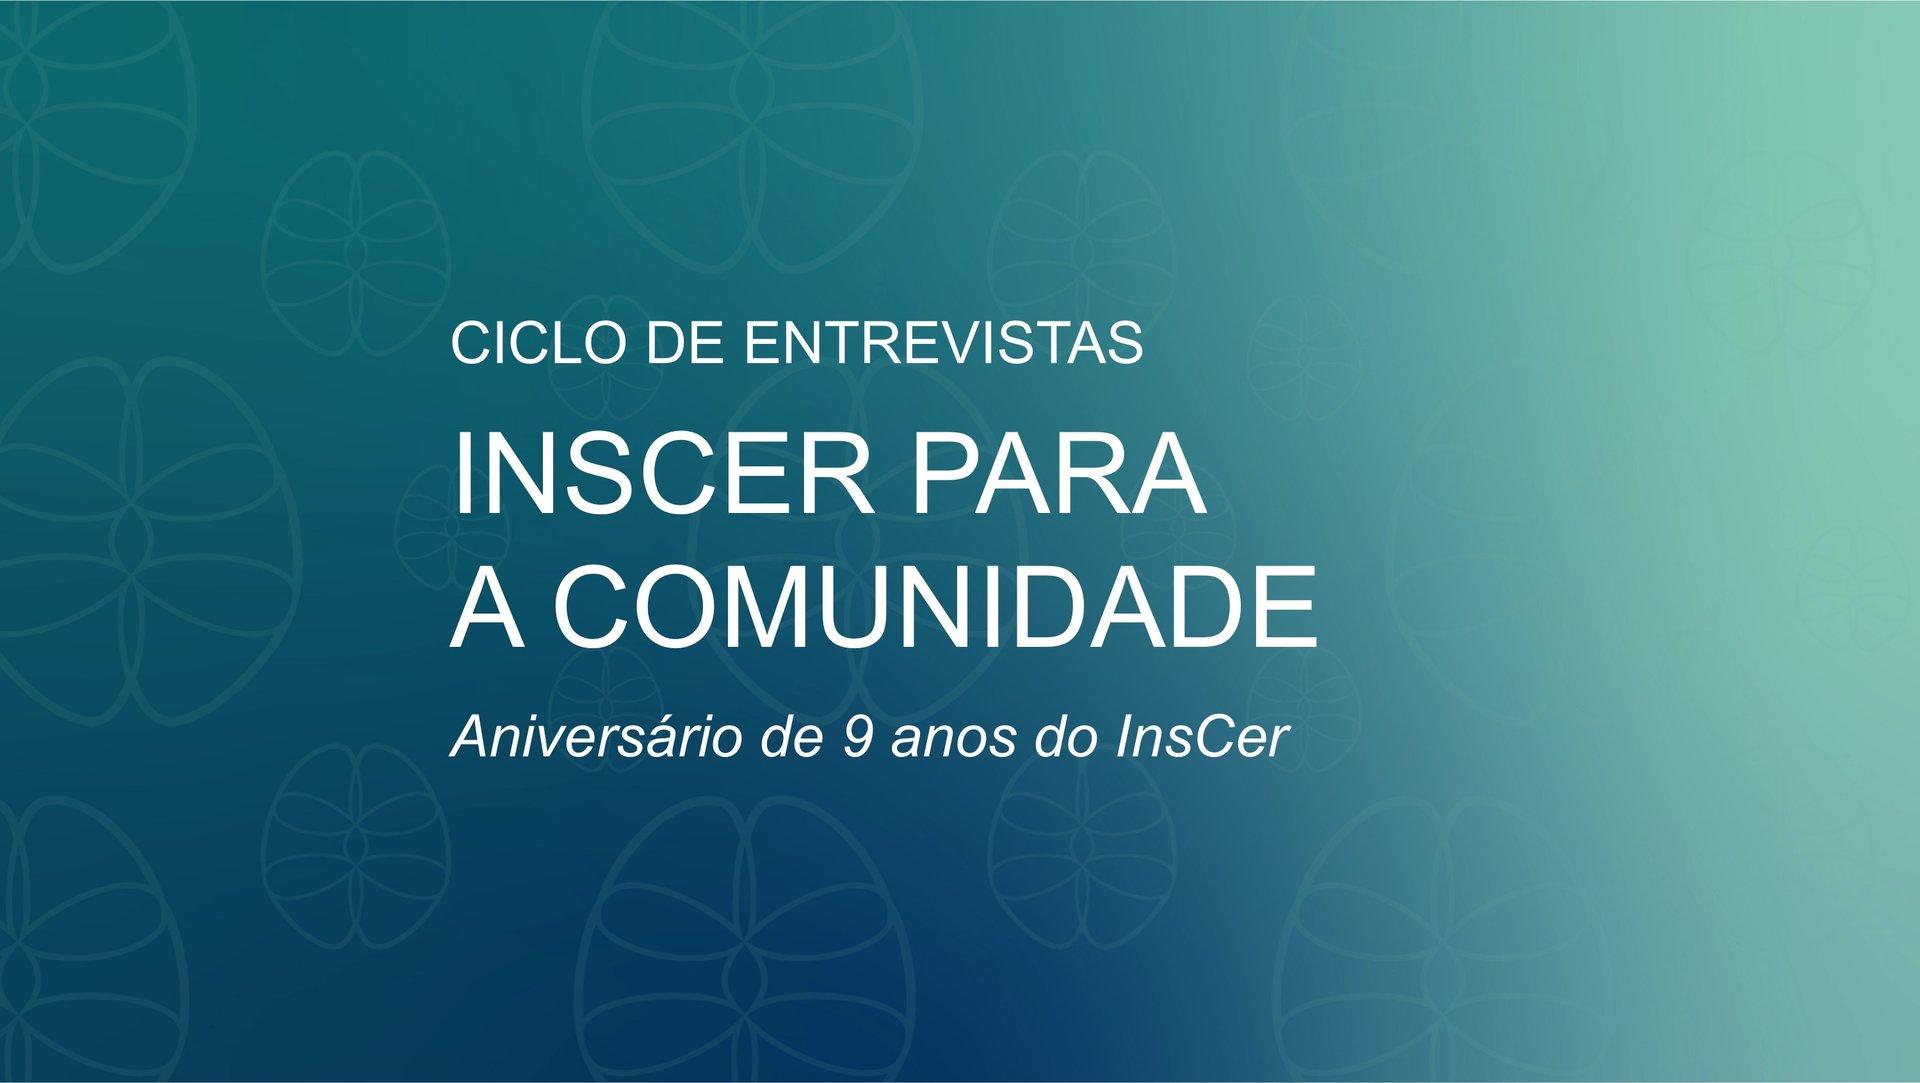 Ciclo de entrevistas - InsCer para a Comunidade